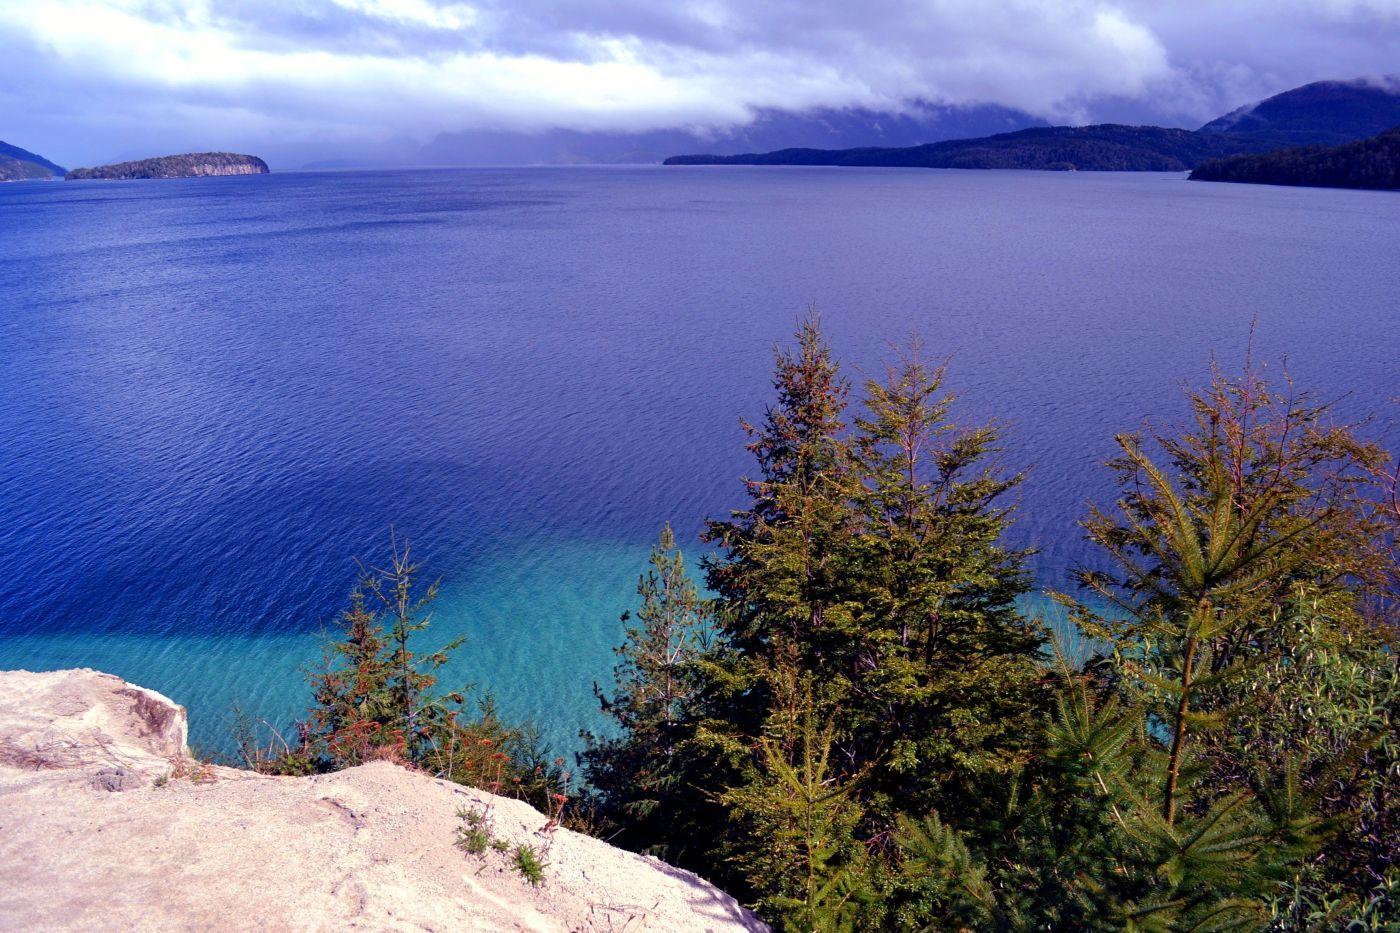 Colorchallenge - Saturday indigo - Lago Nahuel Huapi — Steemit